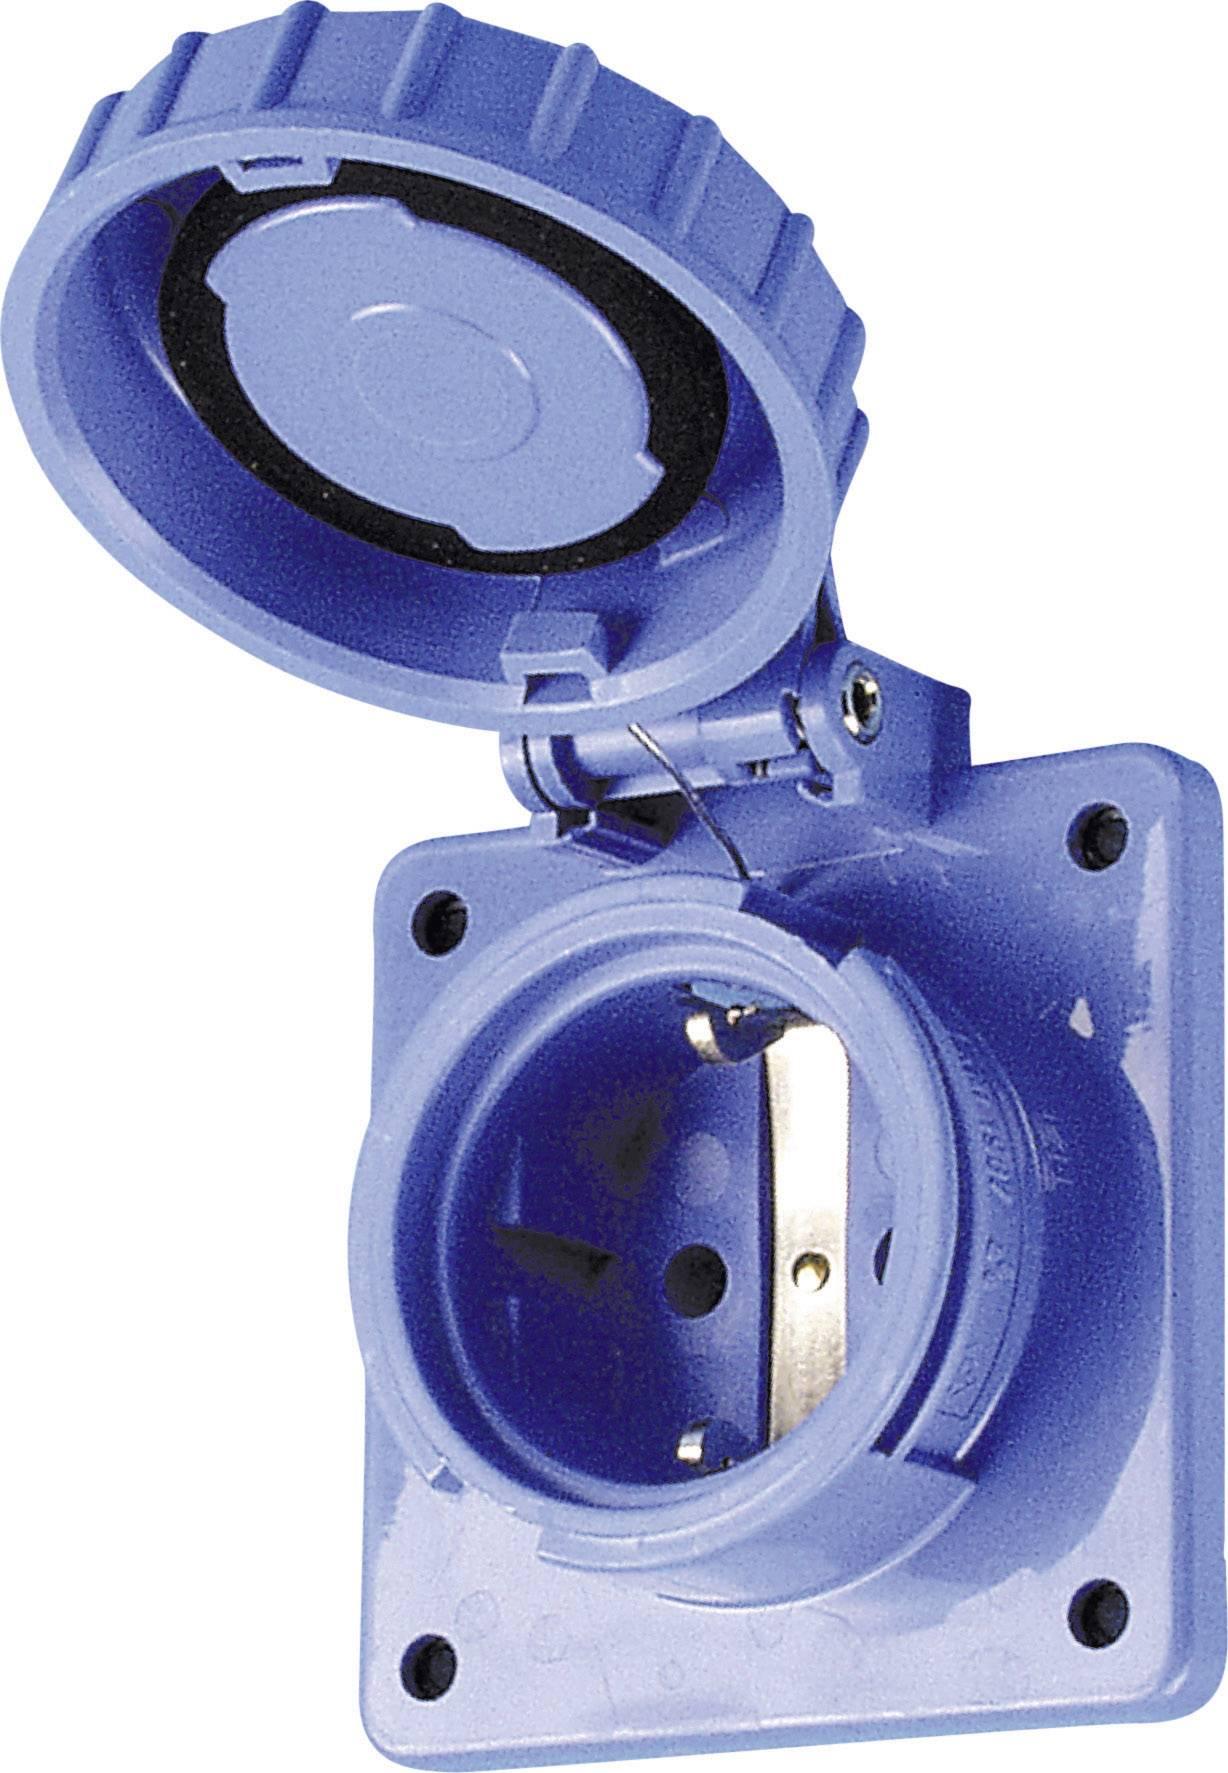 Vestavná zásuvka ABL Sursum 611776 IP68, modrá